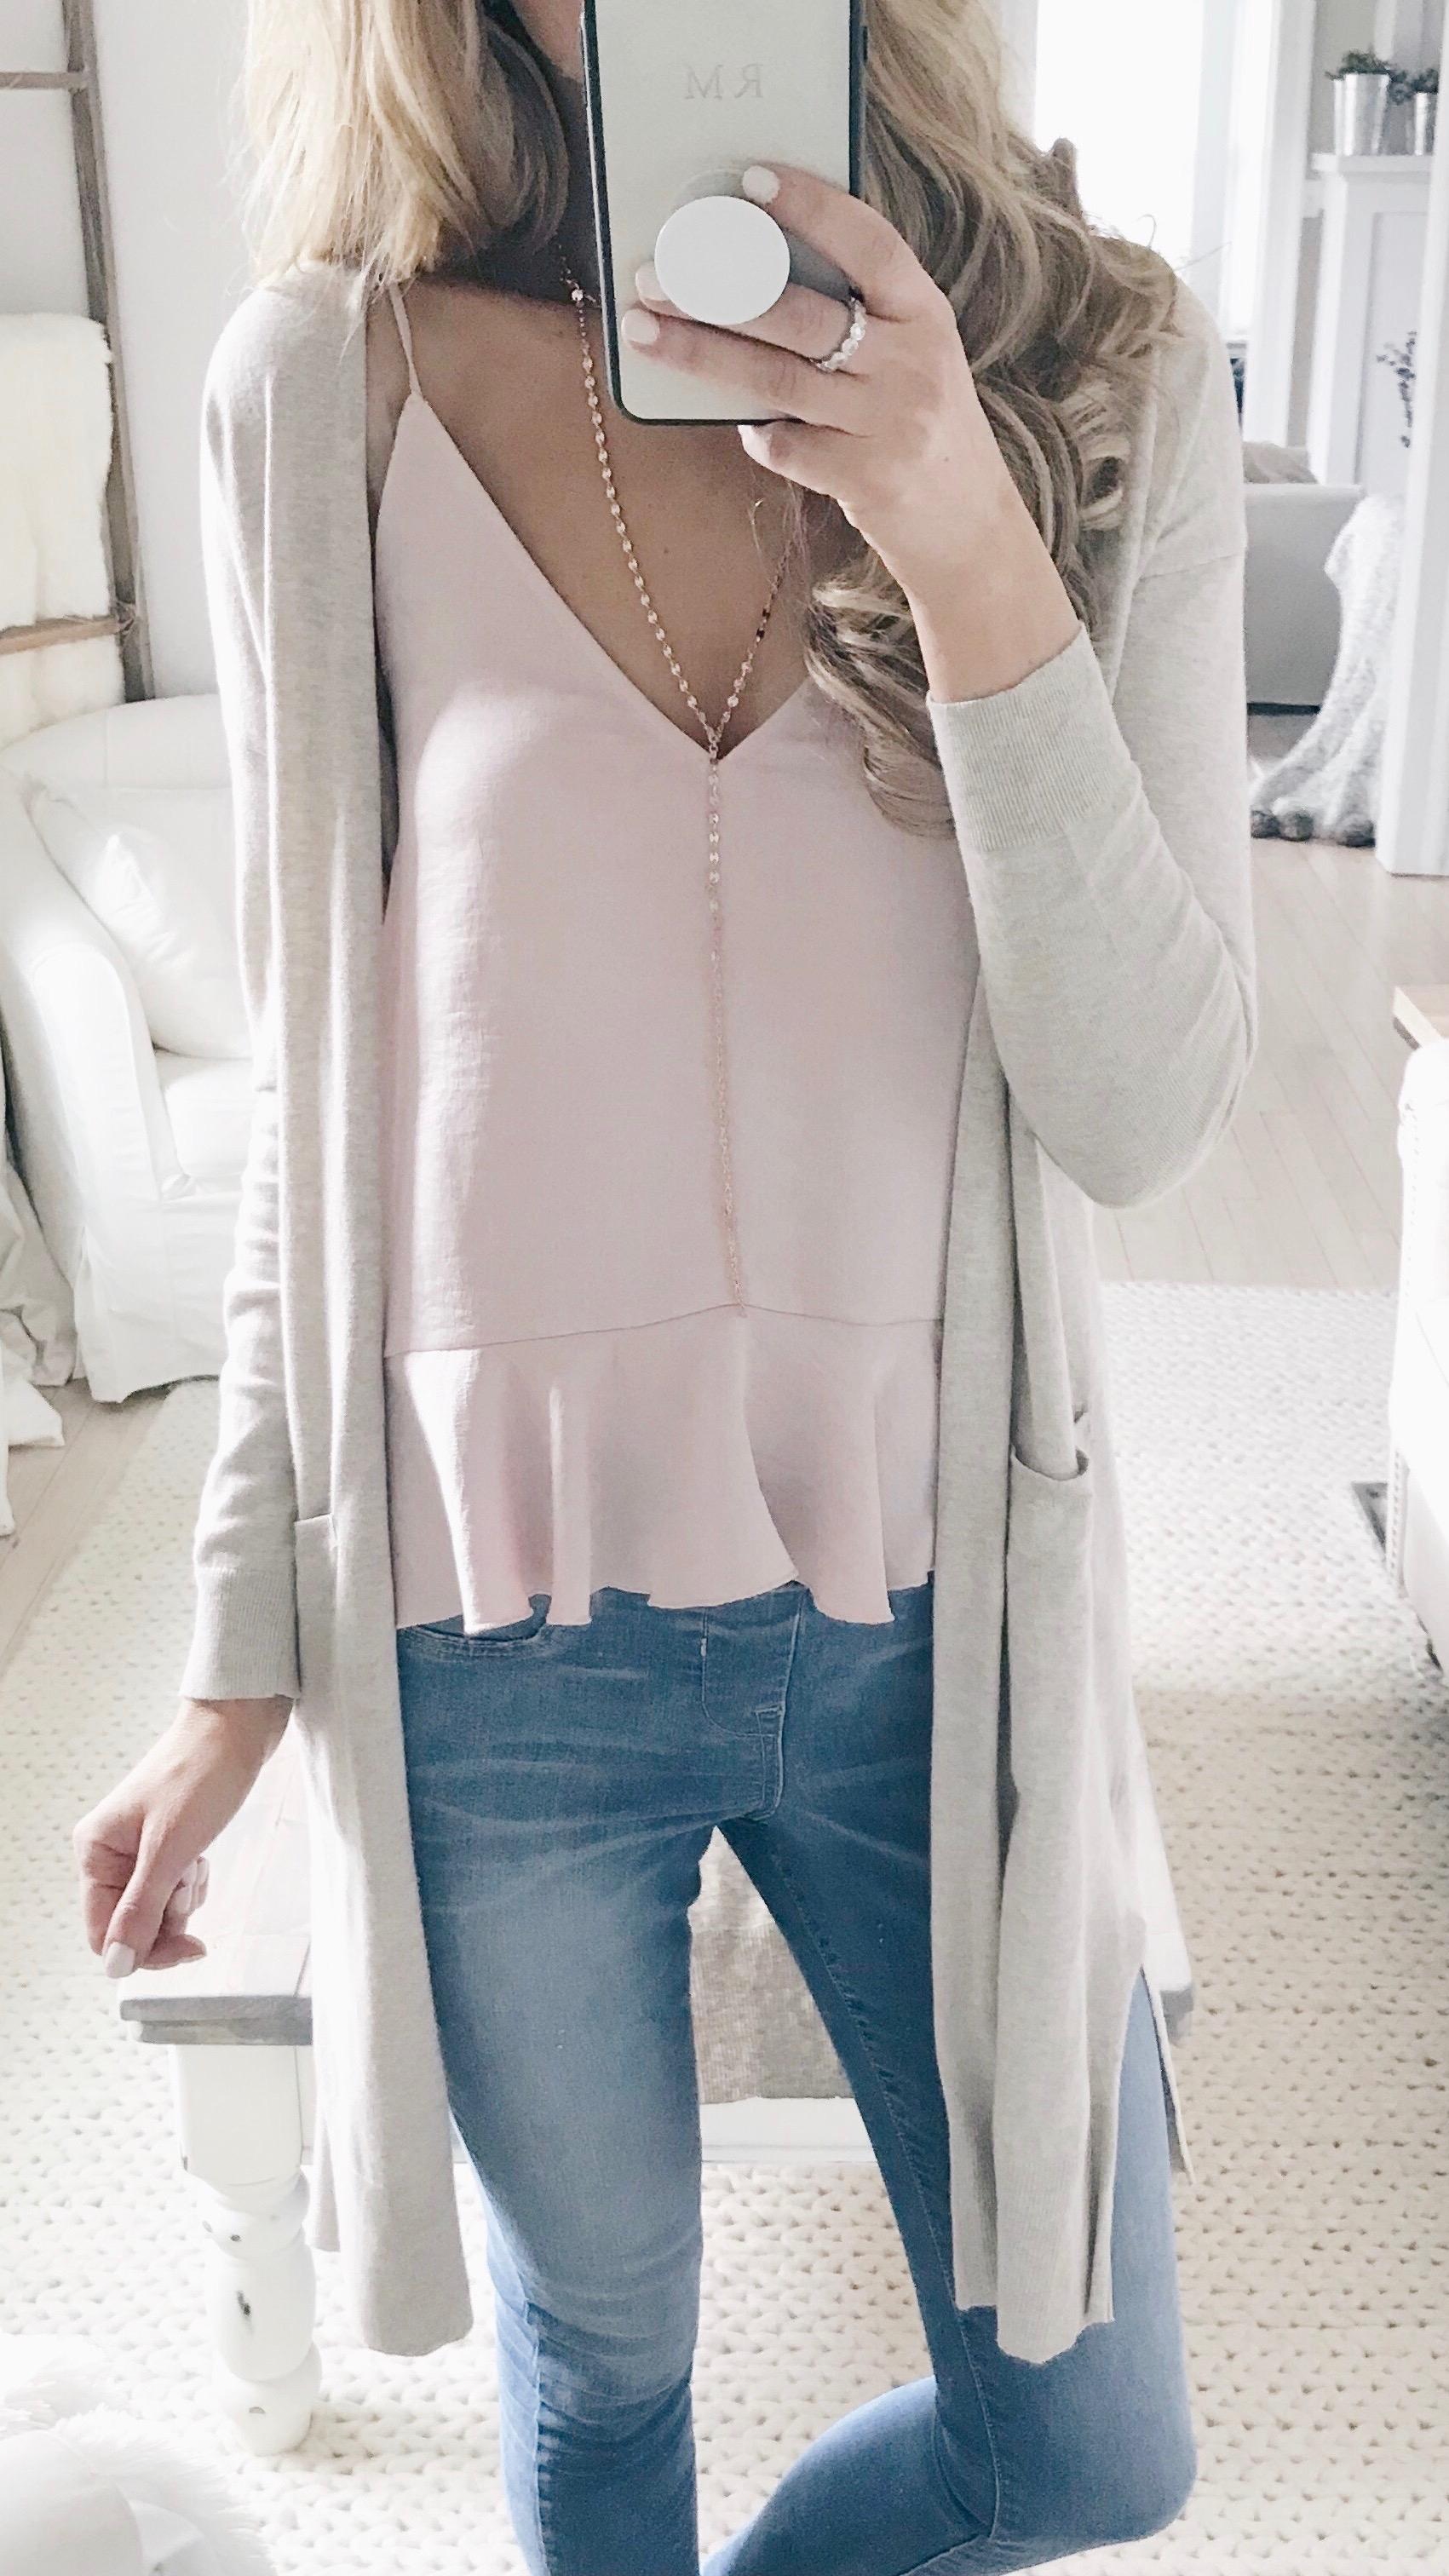 spring outfit ideas - neutral cardigan over peplum cami on pinterestingplans fashion blog